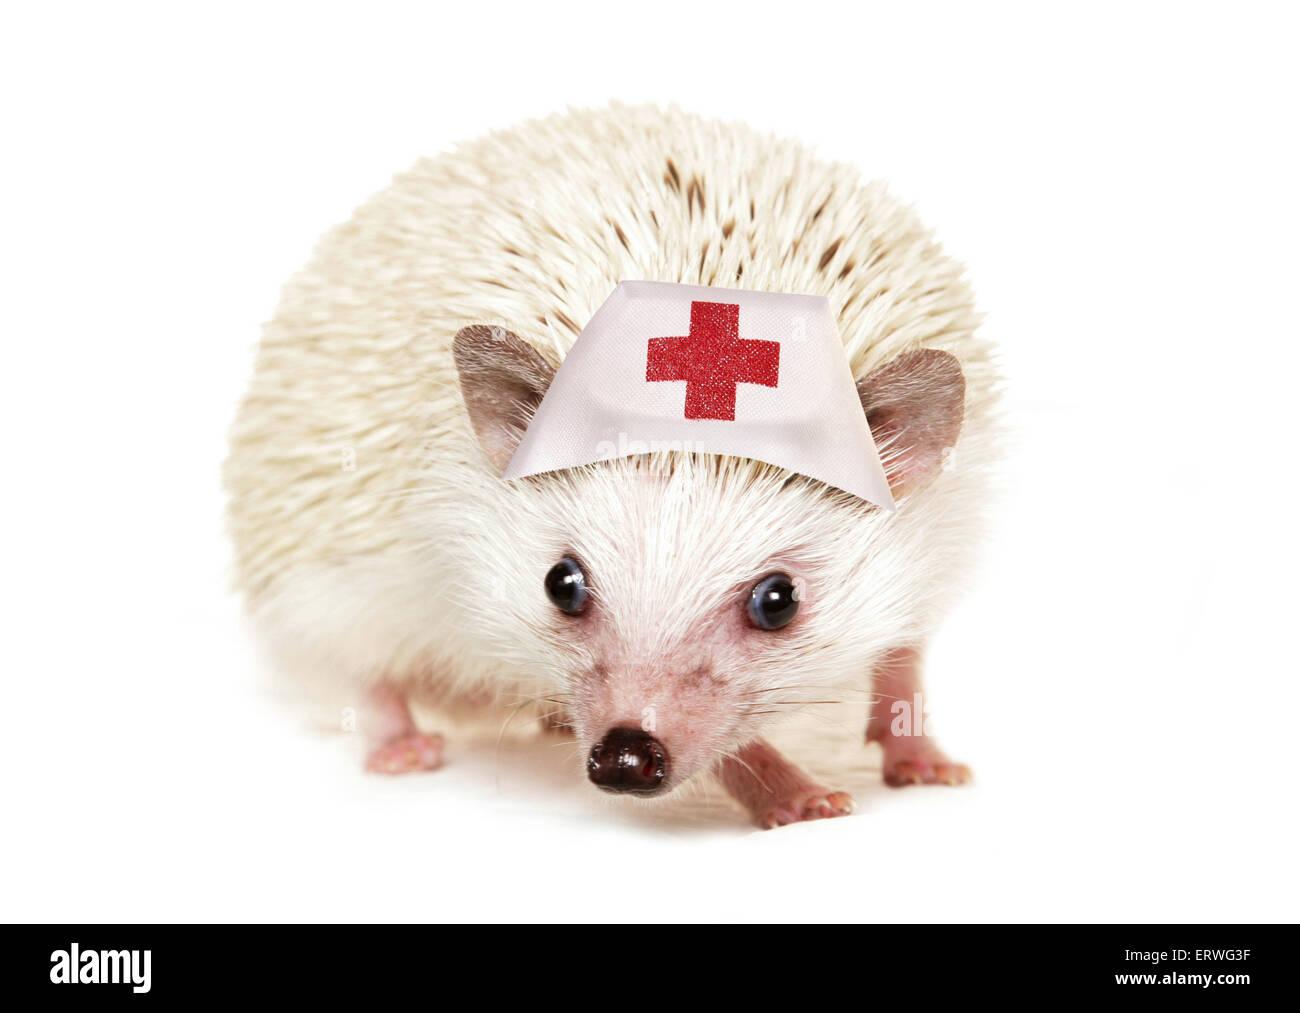 Pygmy hedgehog wearing a nurse hat cutout - Stock Image